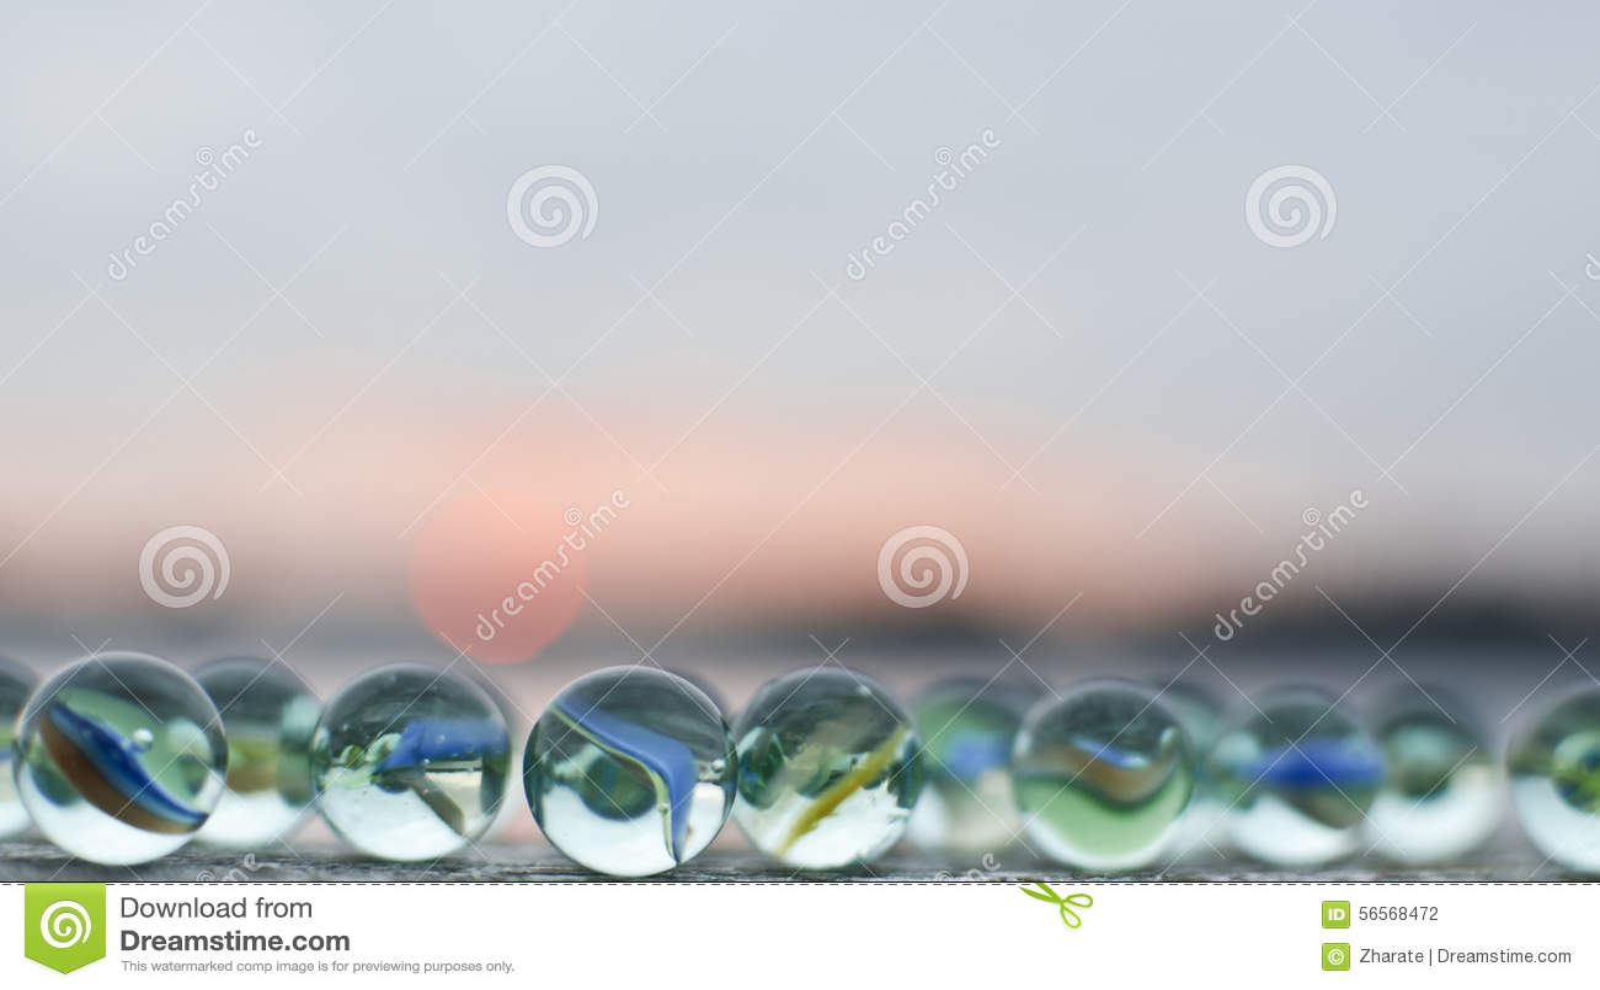 Download Μάρμαρα γυαλιού στο ηλιοβασίλεμα Στοκ Εικόνες - εικόνα από childhood, υλικό: 56568472